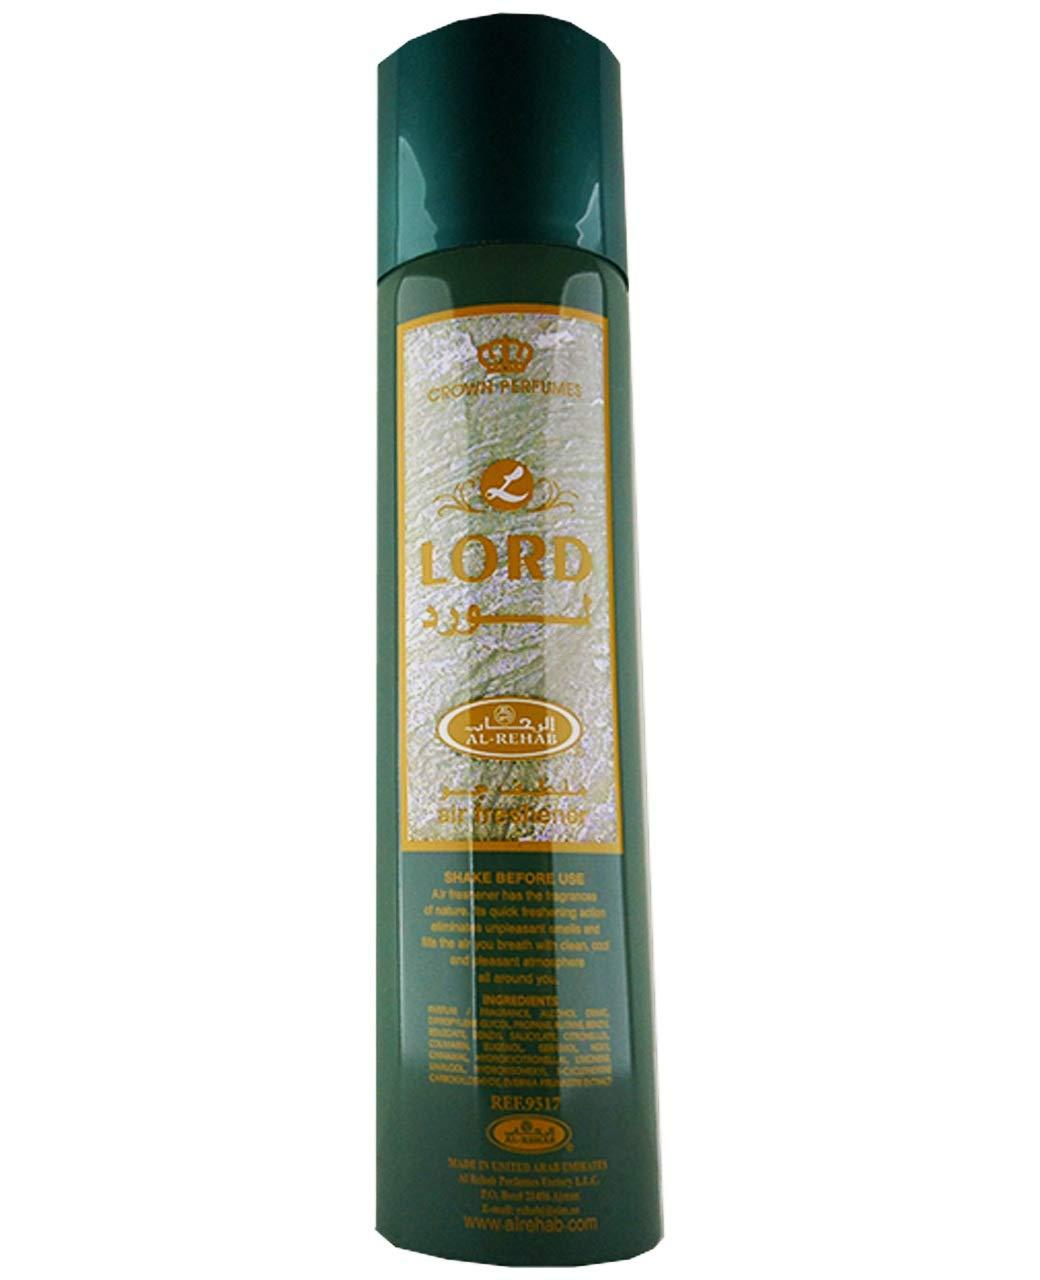 Lord- Air Freshener by Al-Rehab (300ml)